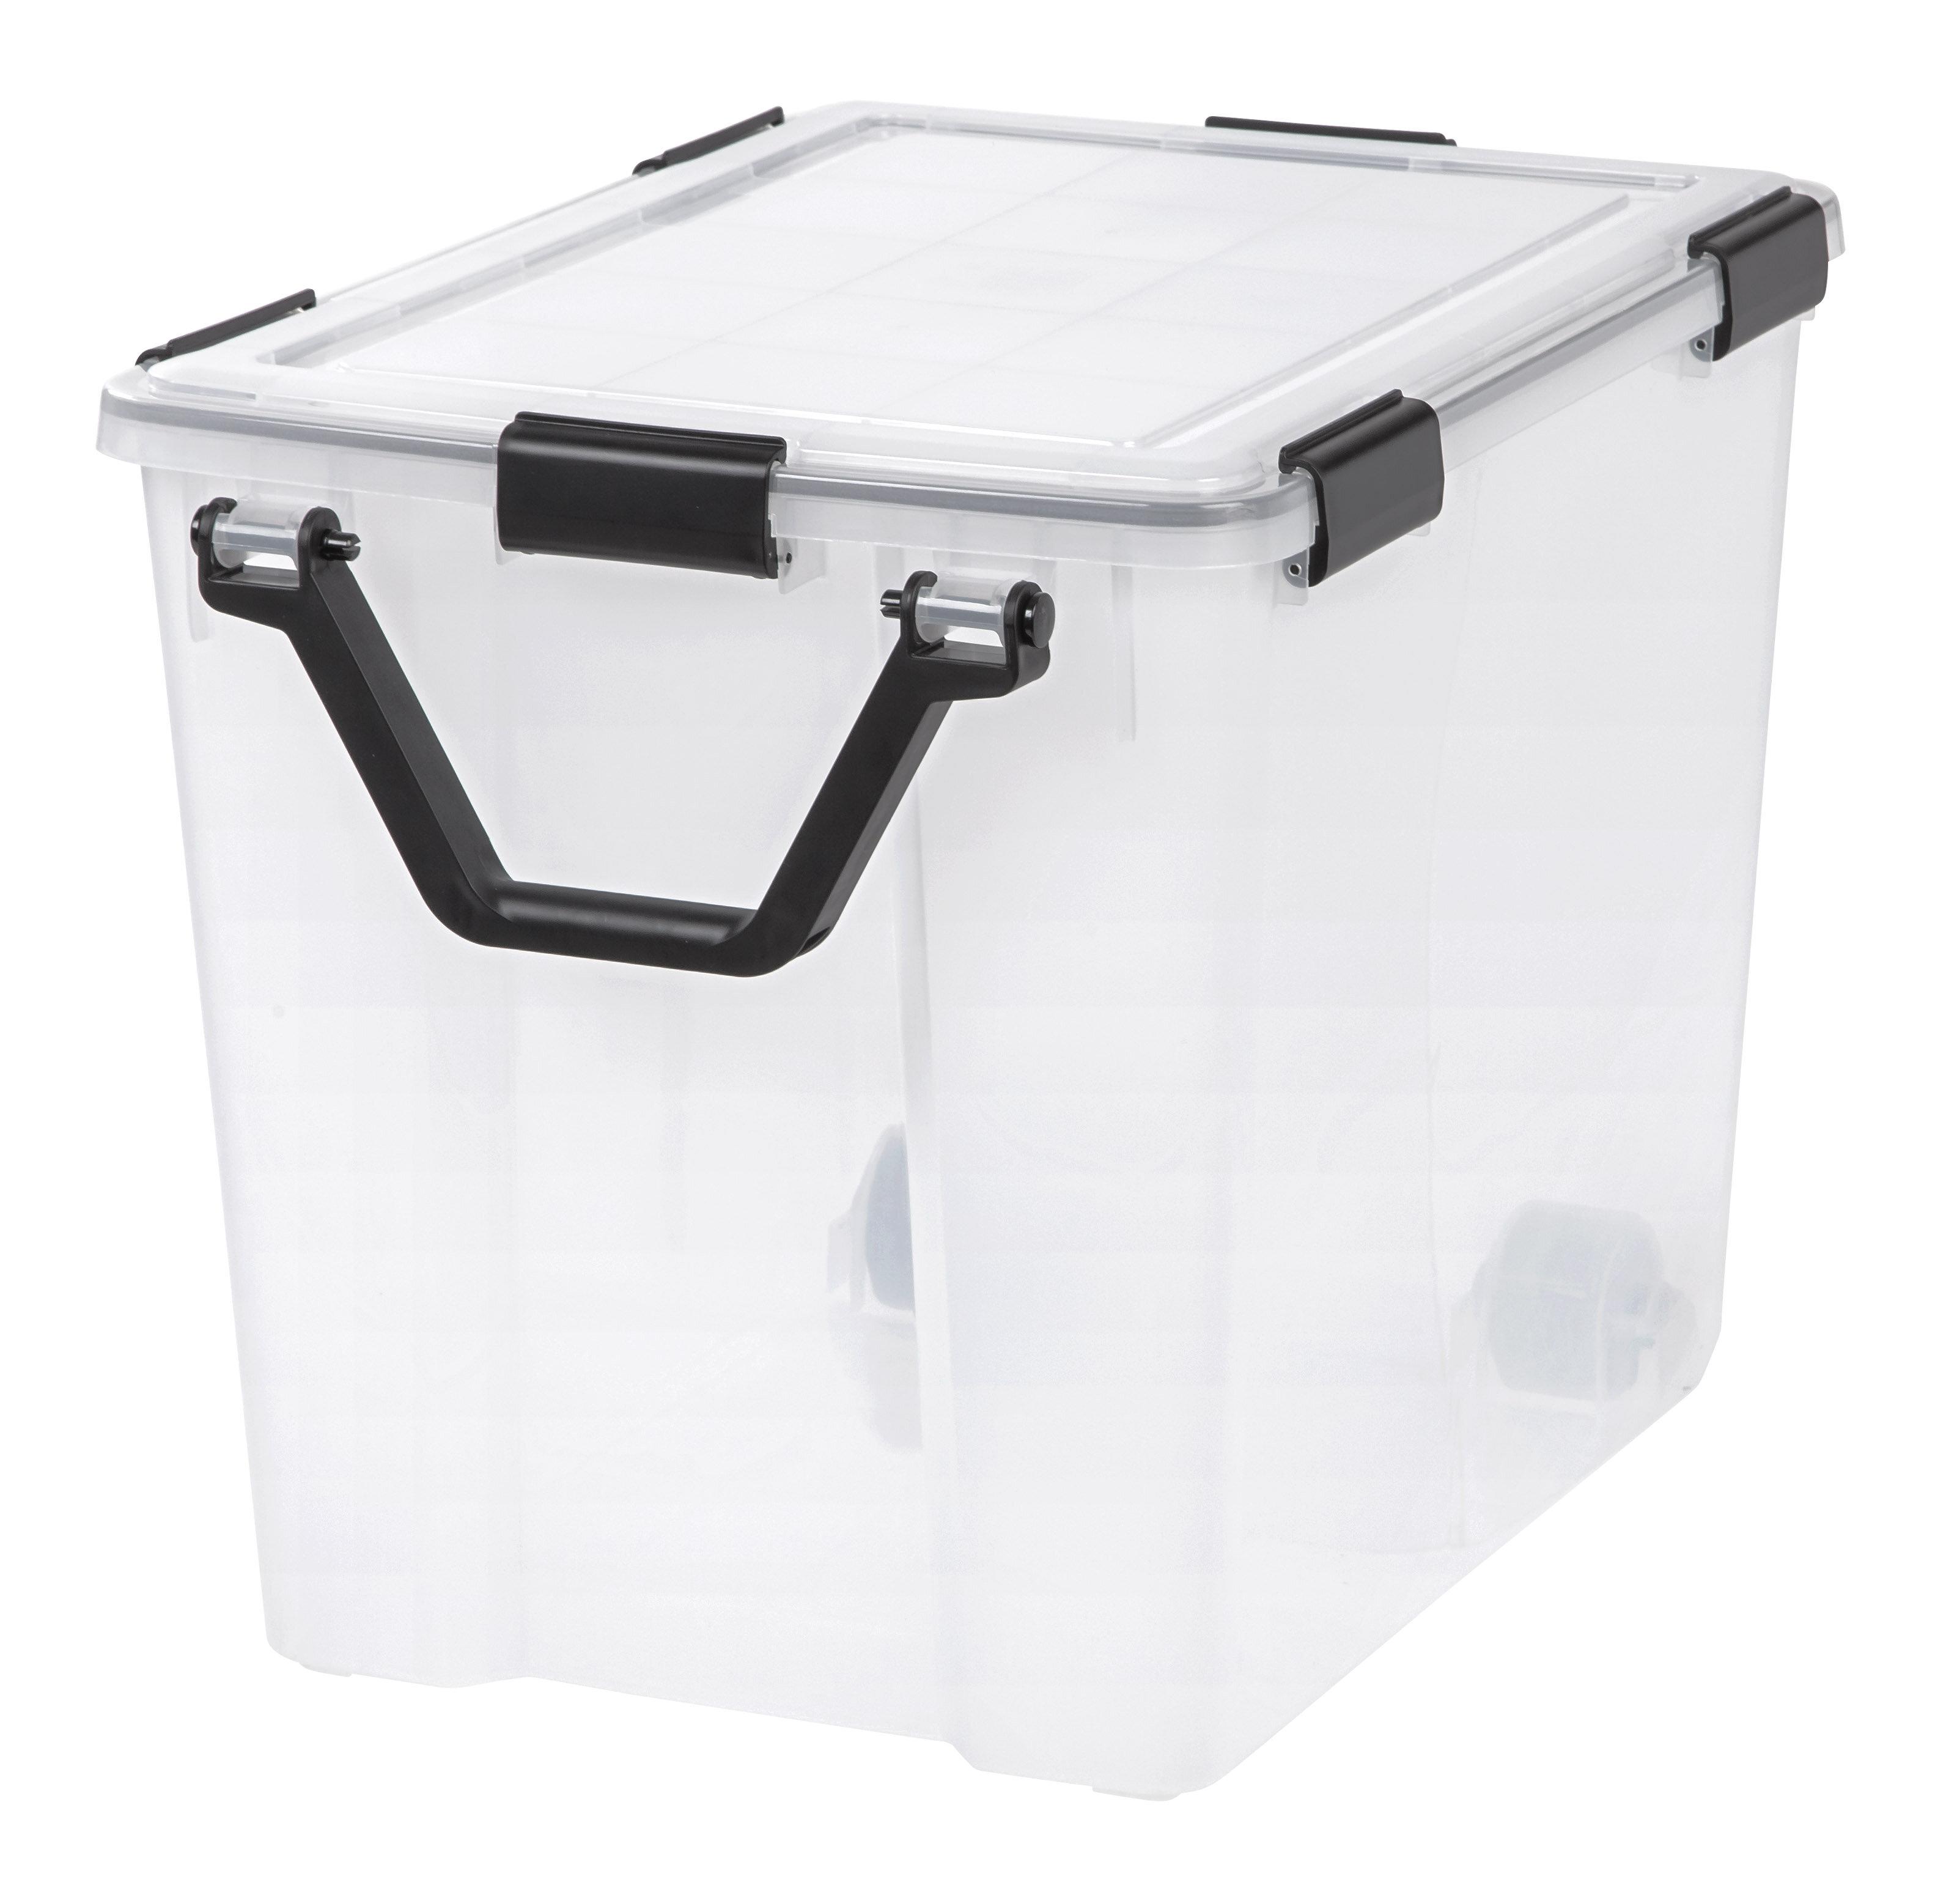 Weathertight 103 Qt Plastic Storage Tote